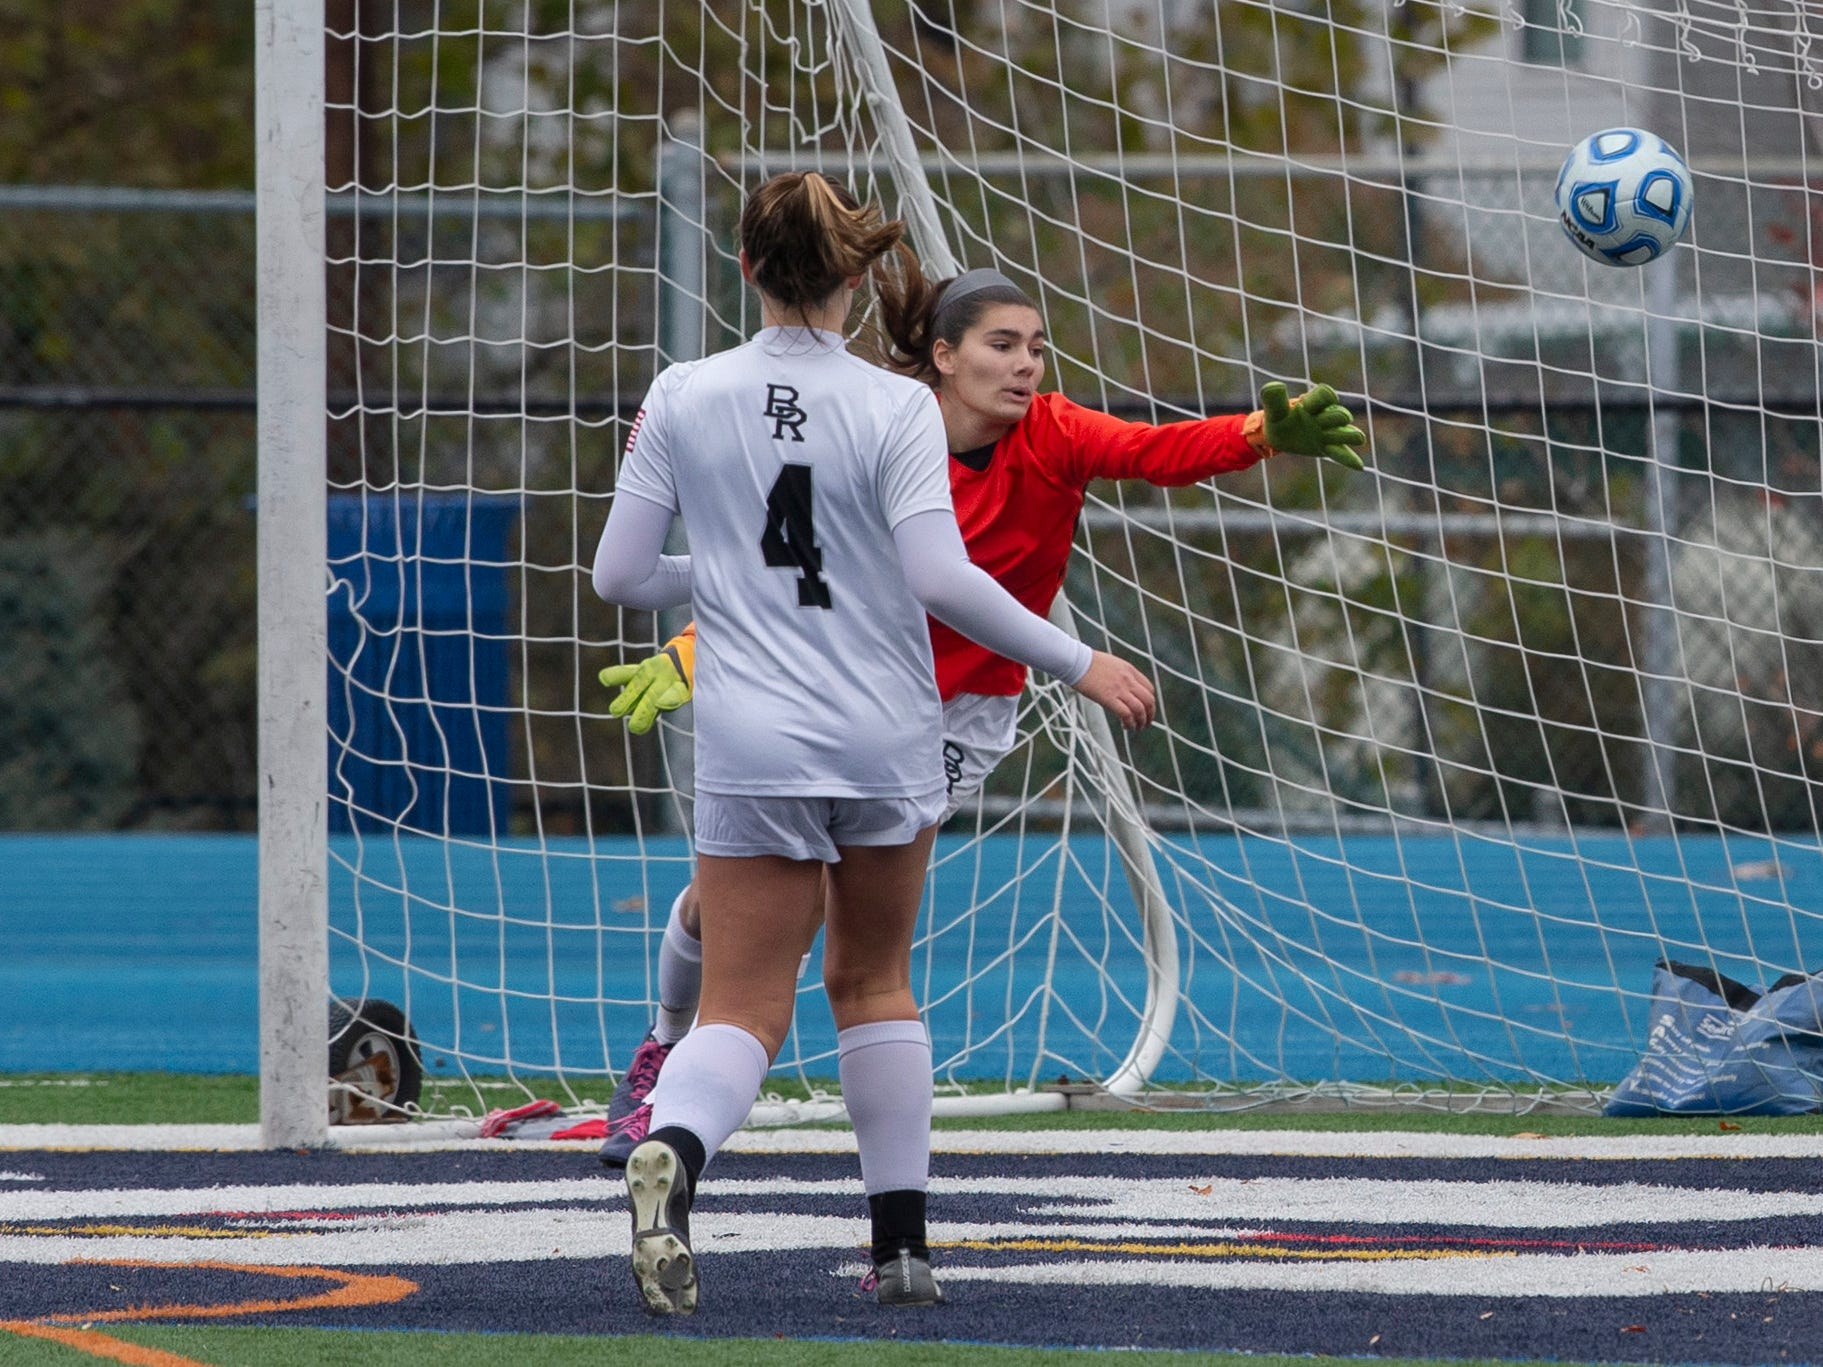 Eastern's Kelli McGroarty (10) watches as her shot gets by Bridgewater Raritan goalie Maggie Ousouljoglou for game winning goall. Bridgewater-Raritan vs. Eastern girls soccer in the NJSIAA Group IV final at Kean University.